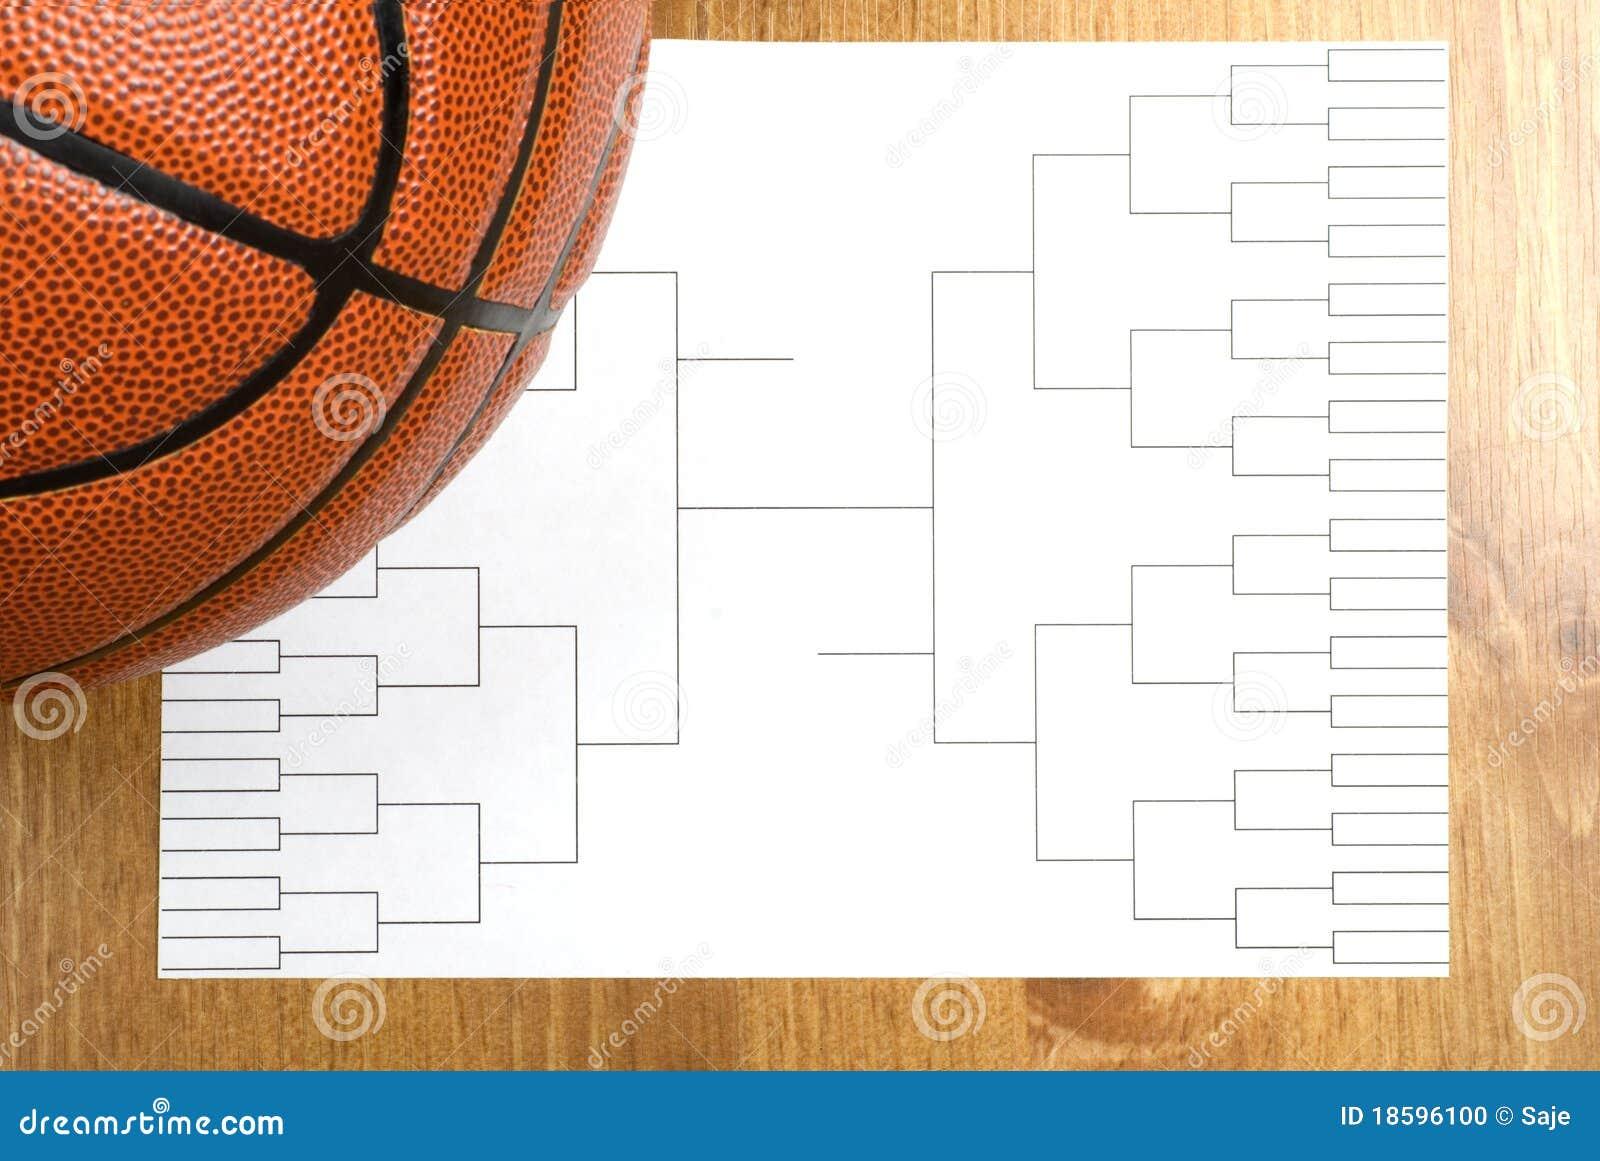 Tournament Bracket Clipart Basketball tournament bracket